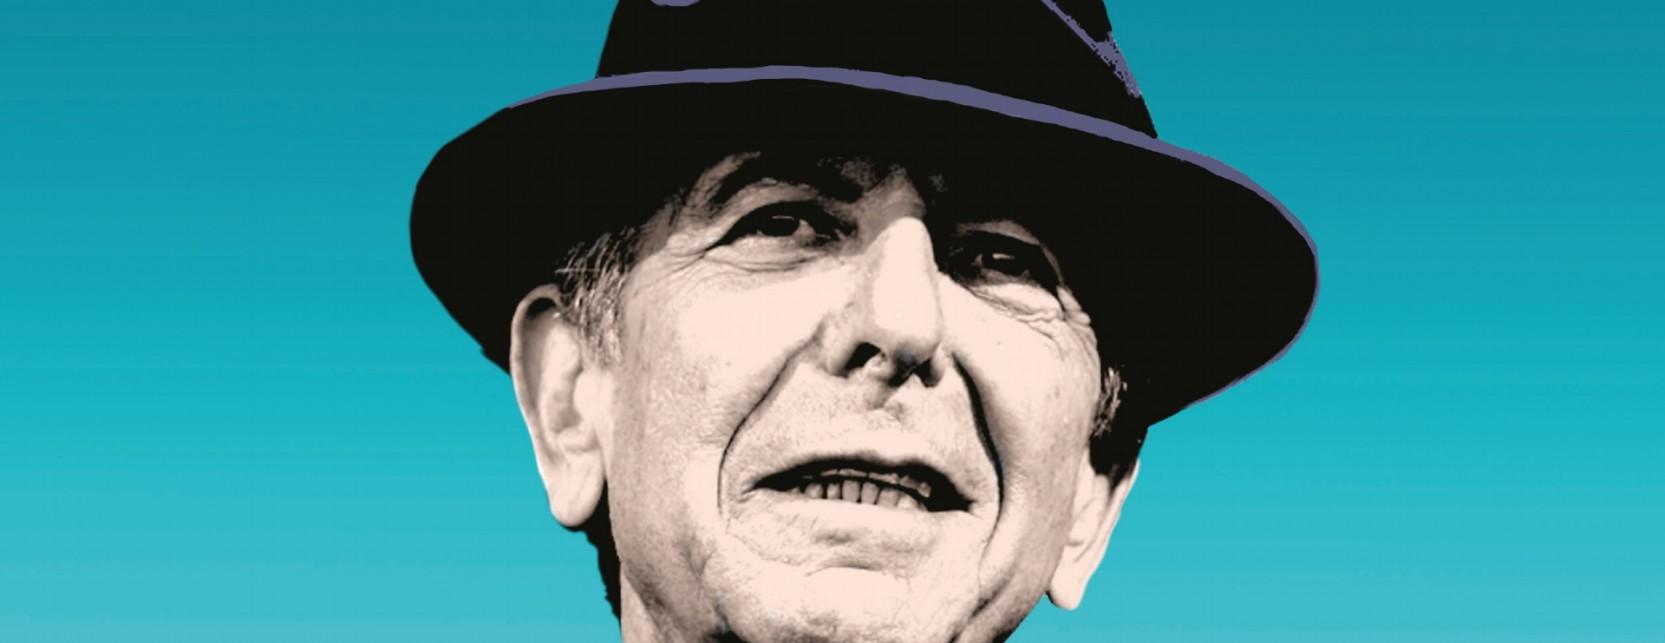 Leonard Cohen Elckerlyc Hilvarenbeek